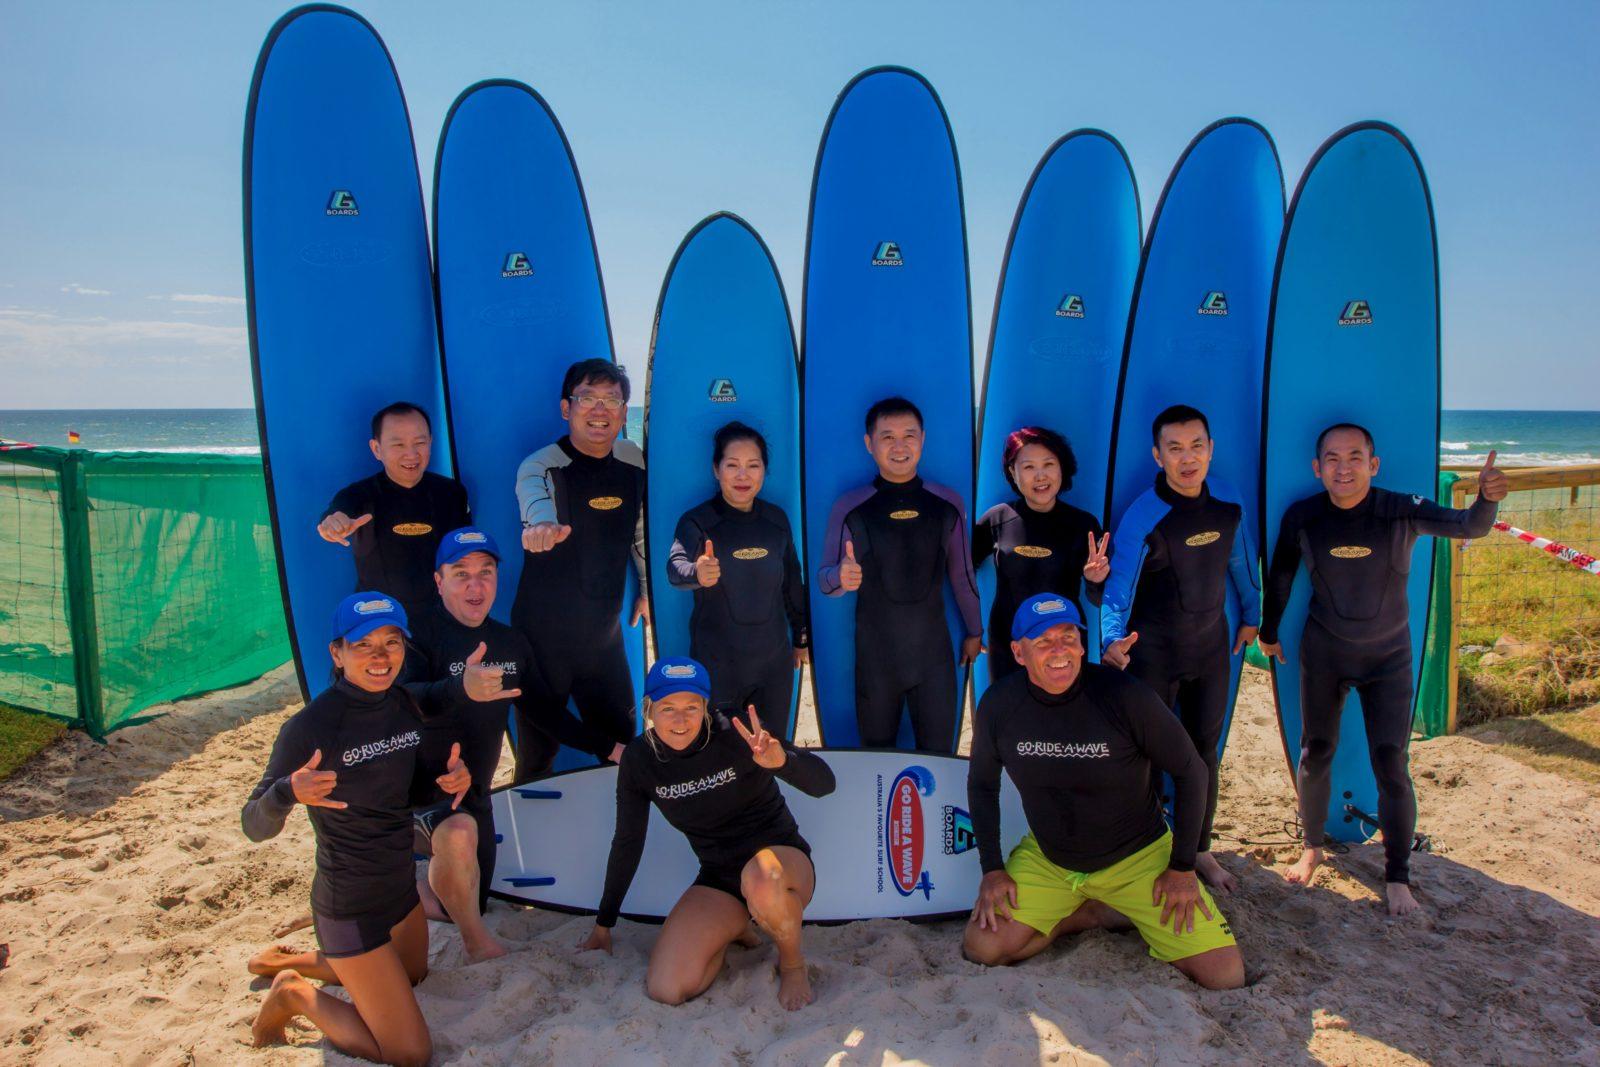 Go Ride A Wave Gold Coast